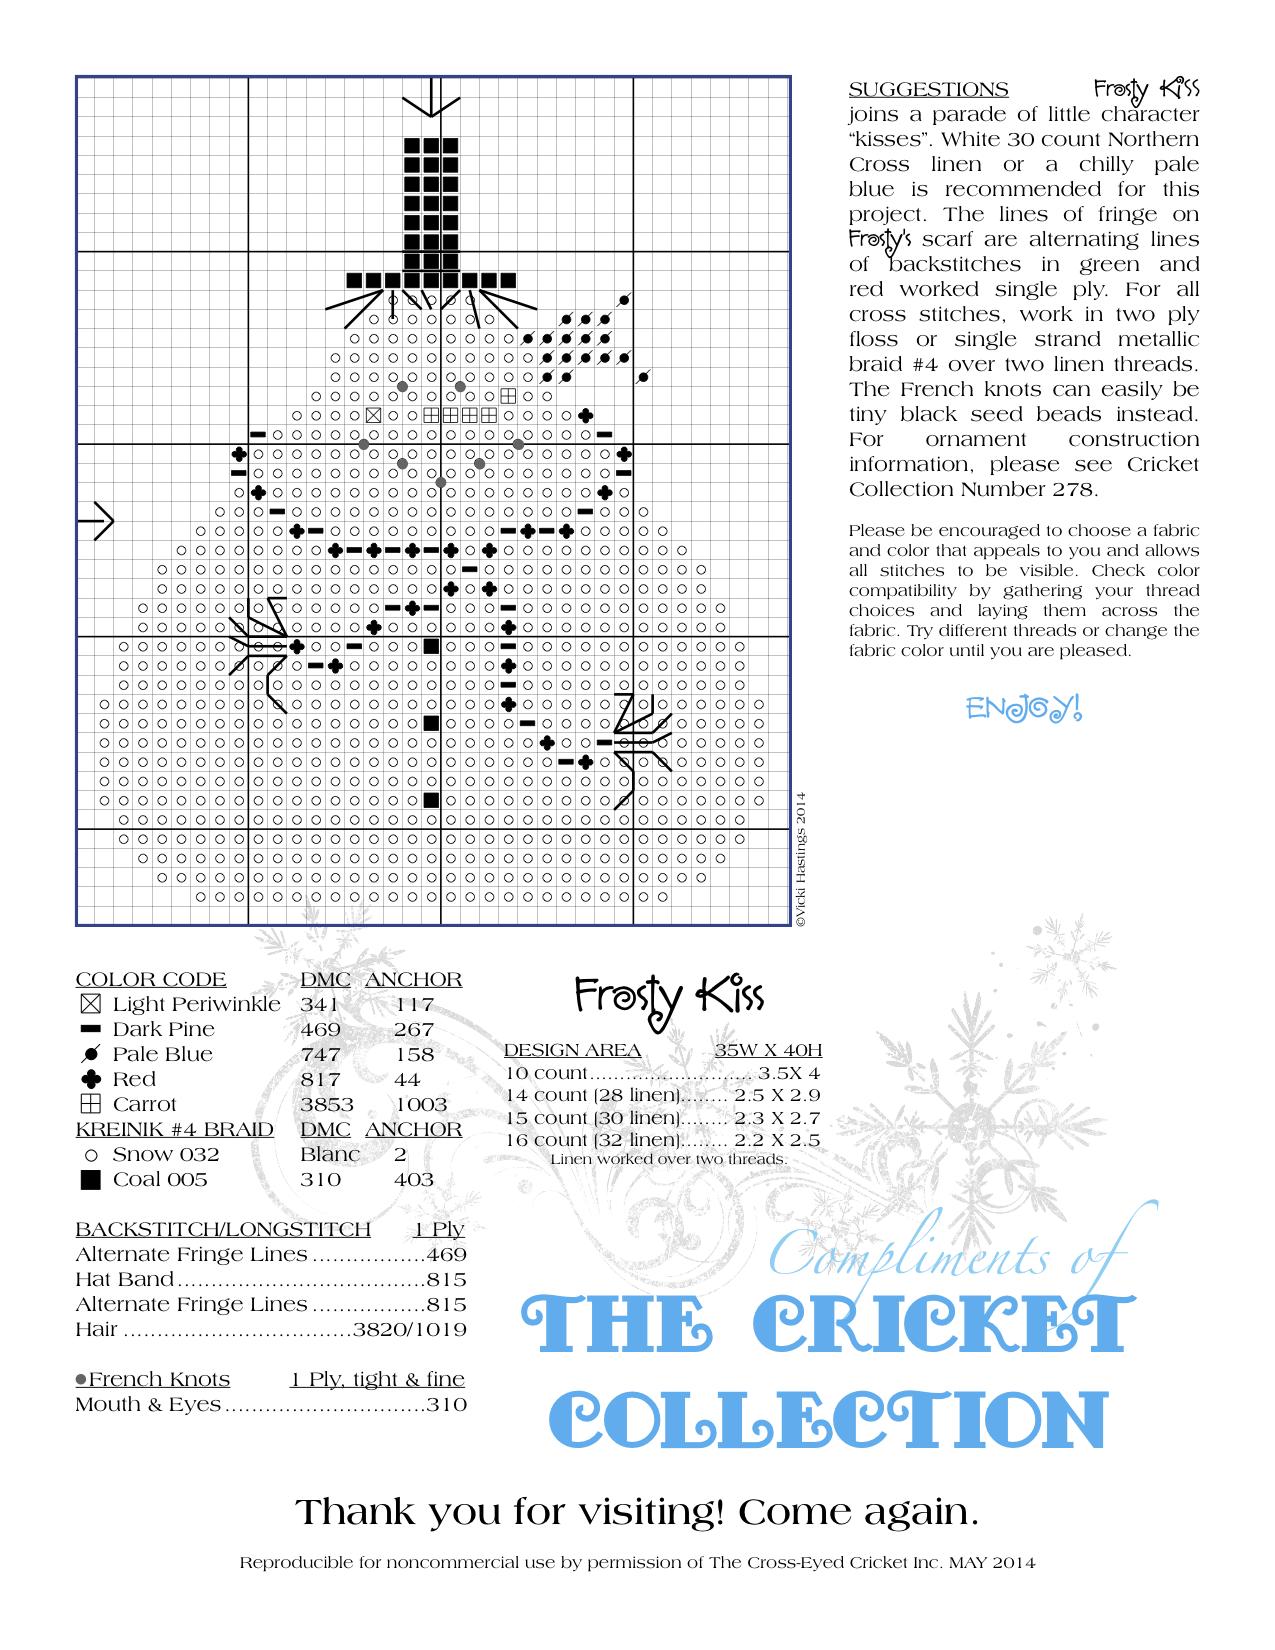 Pin By Clancy Kuehnle On Stitch Let It Snow Pinterest Snowman - 469 area code